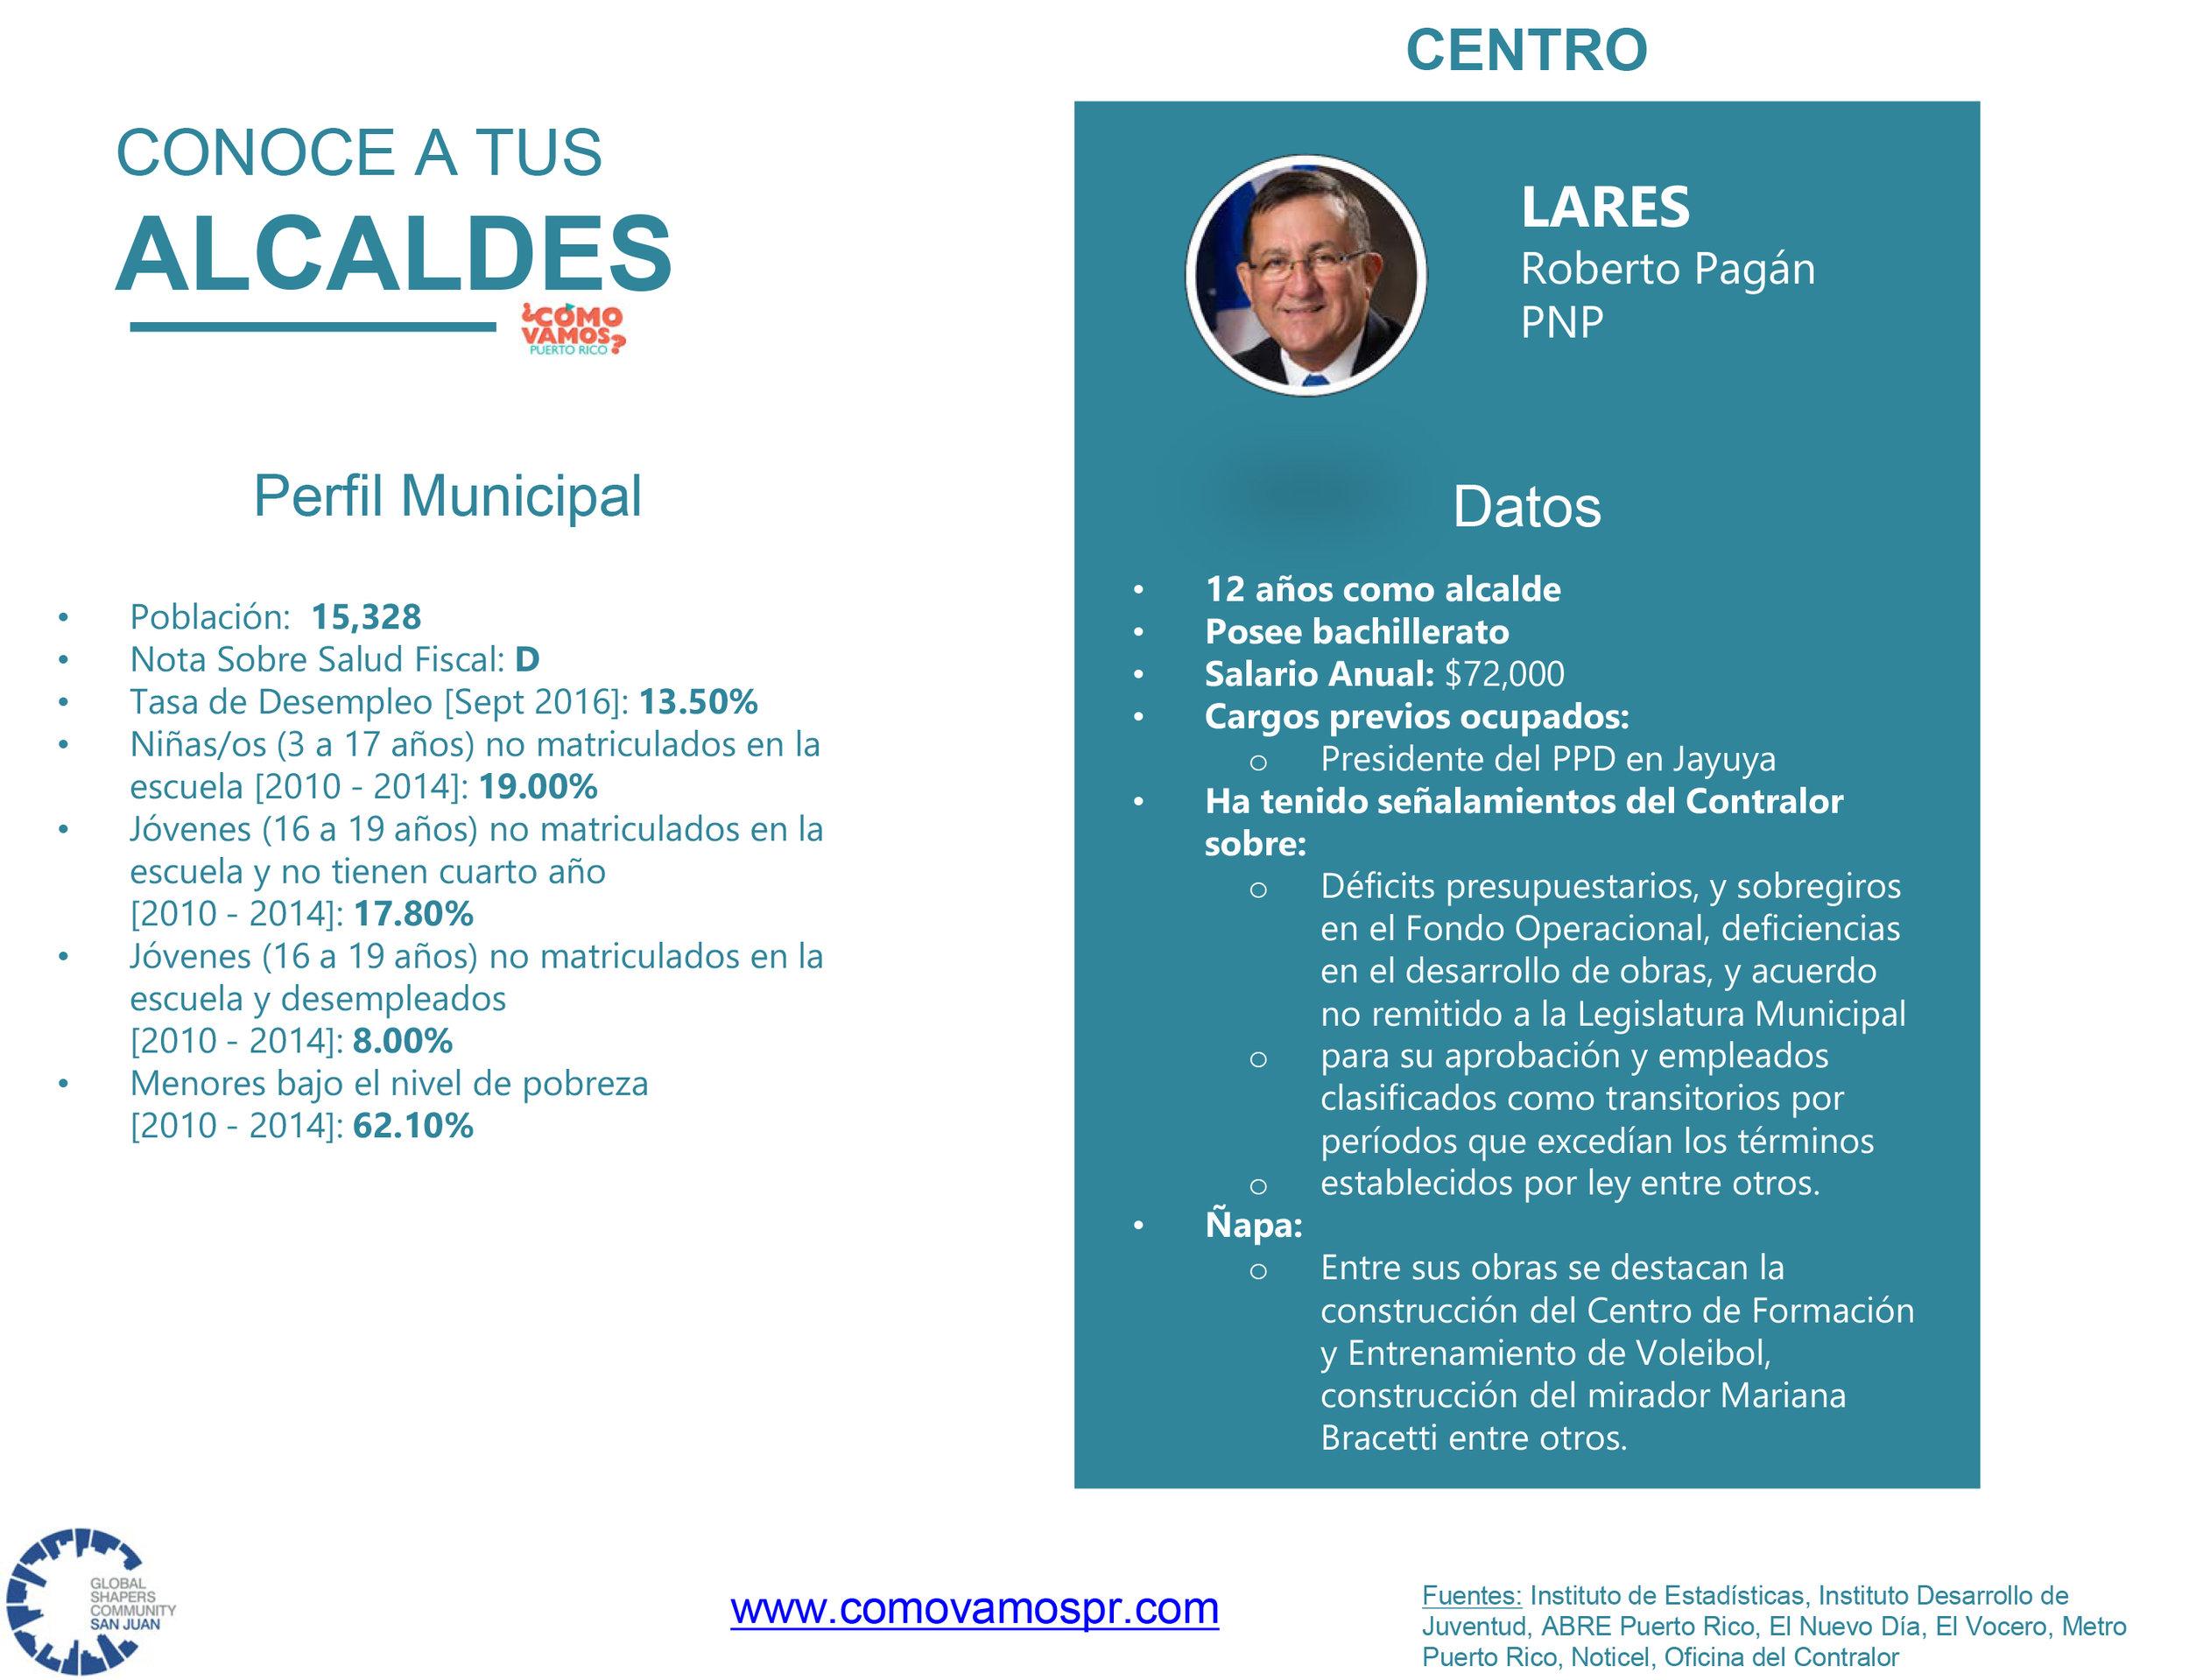 Alcaldes_Centro_Lares.jpg